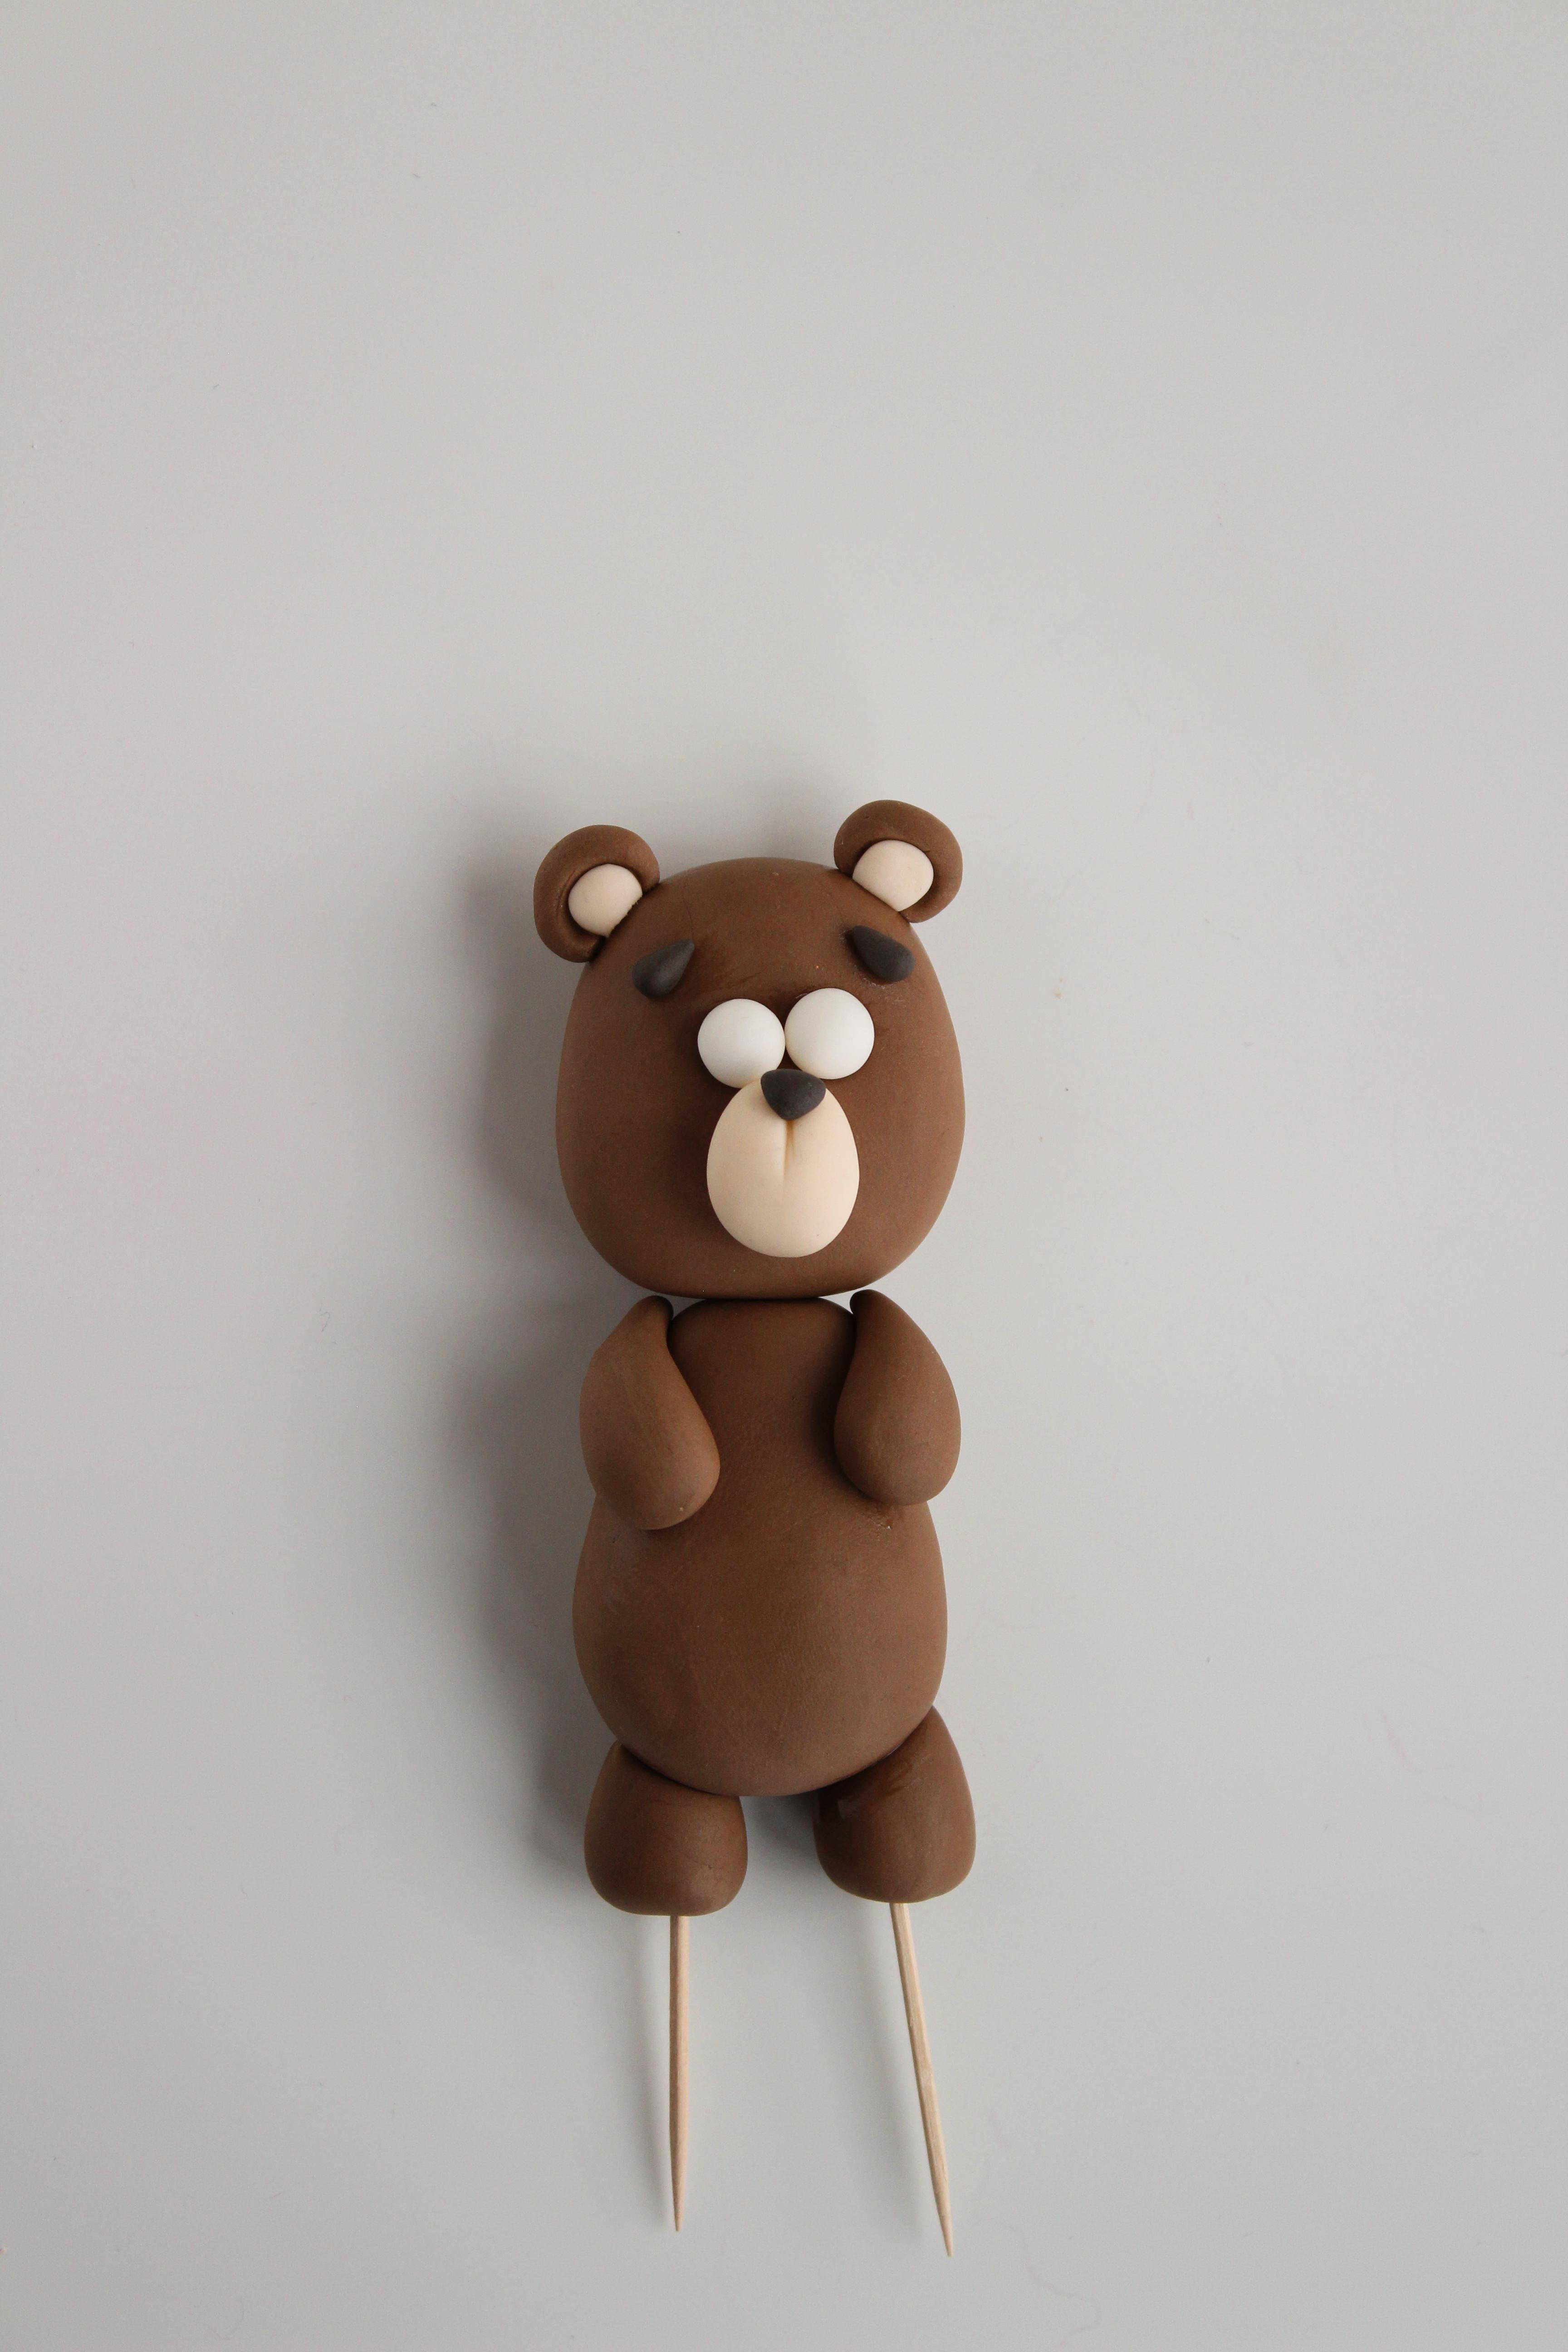 Party-Bear-Cake-8.JPG#asset:23969